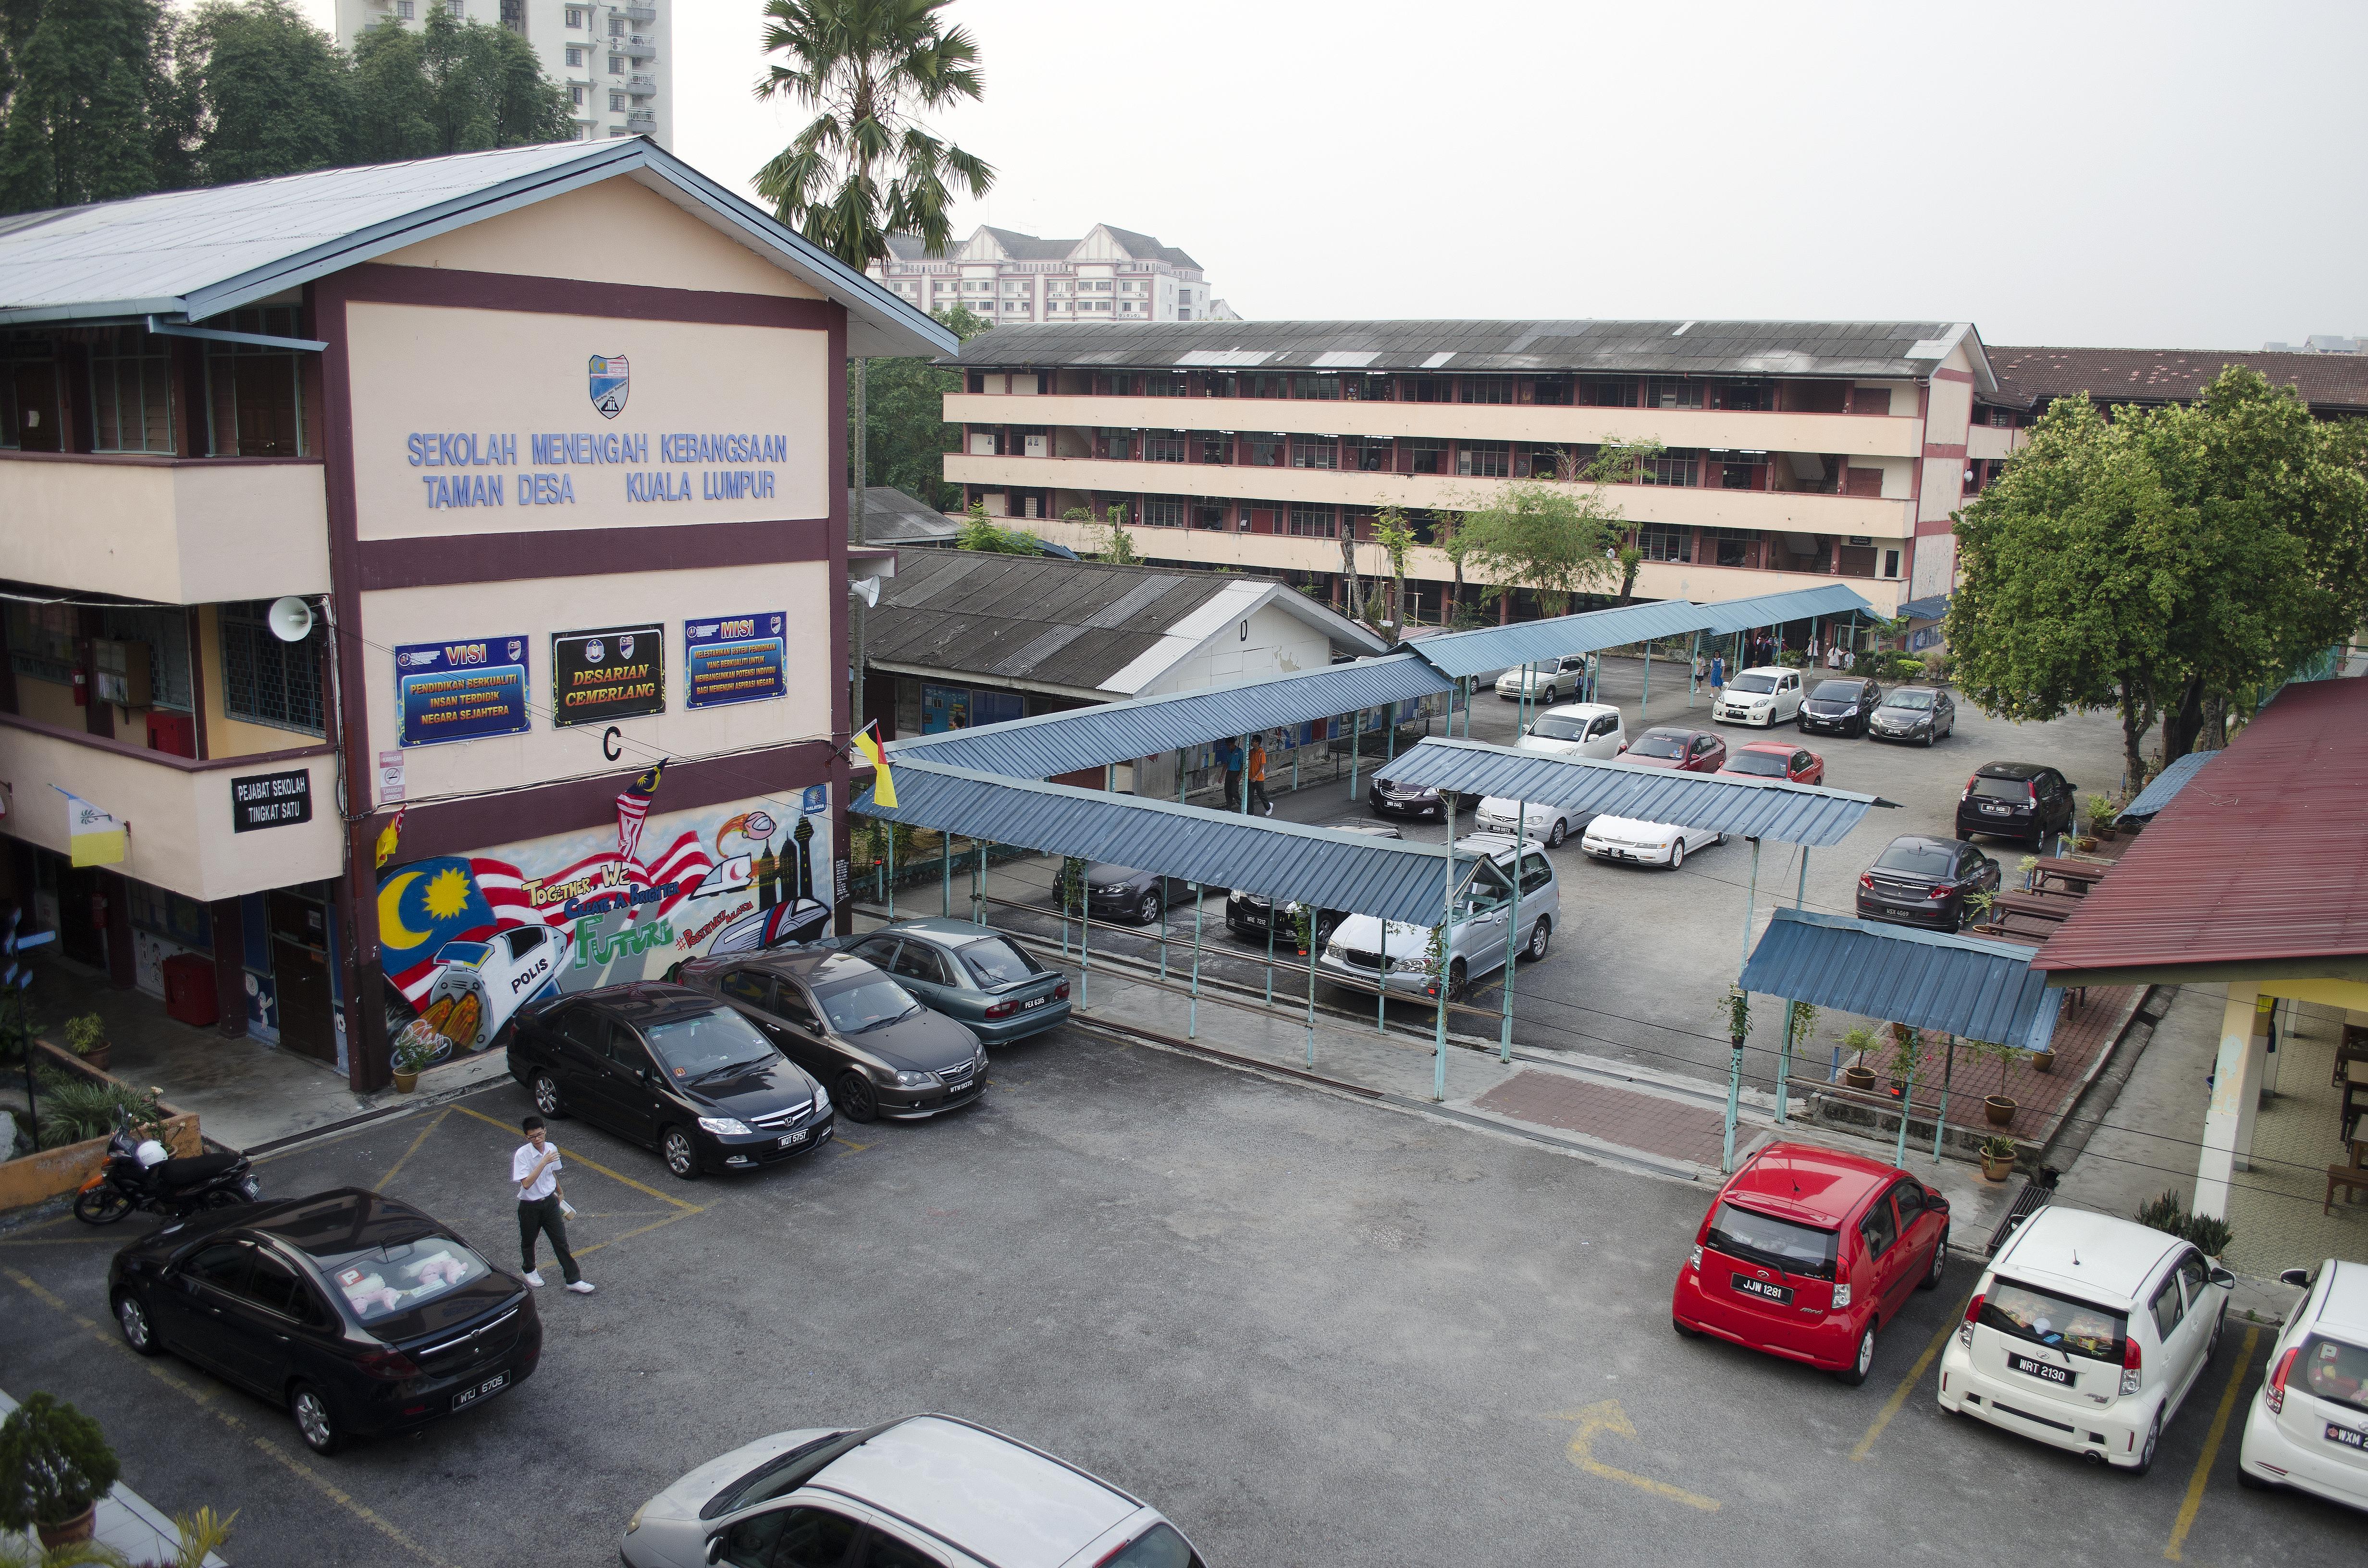 Sekolah Menengah Kebangsaan Taman Desa Wikipedia Bahasa Melayu Ensiklopedia Bebas